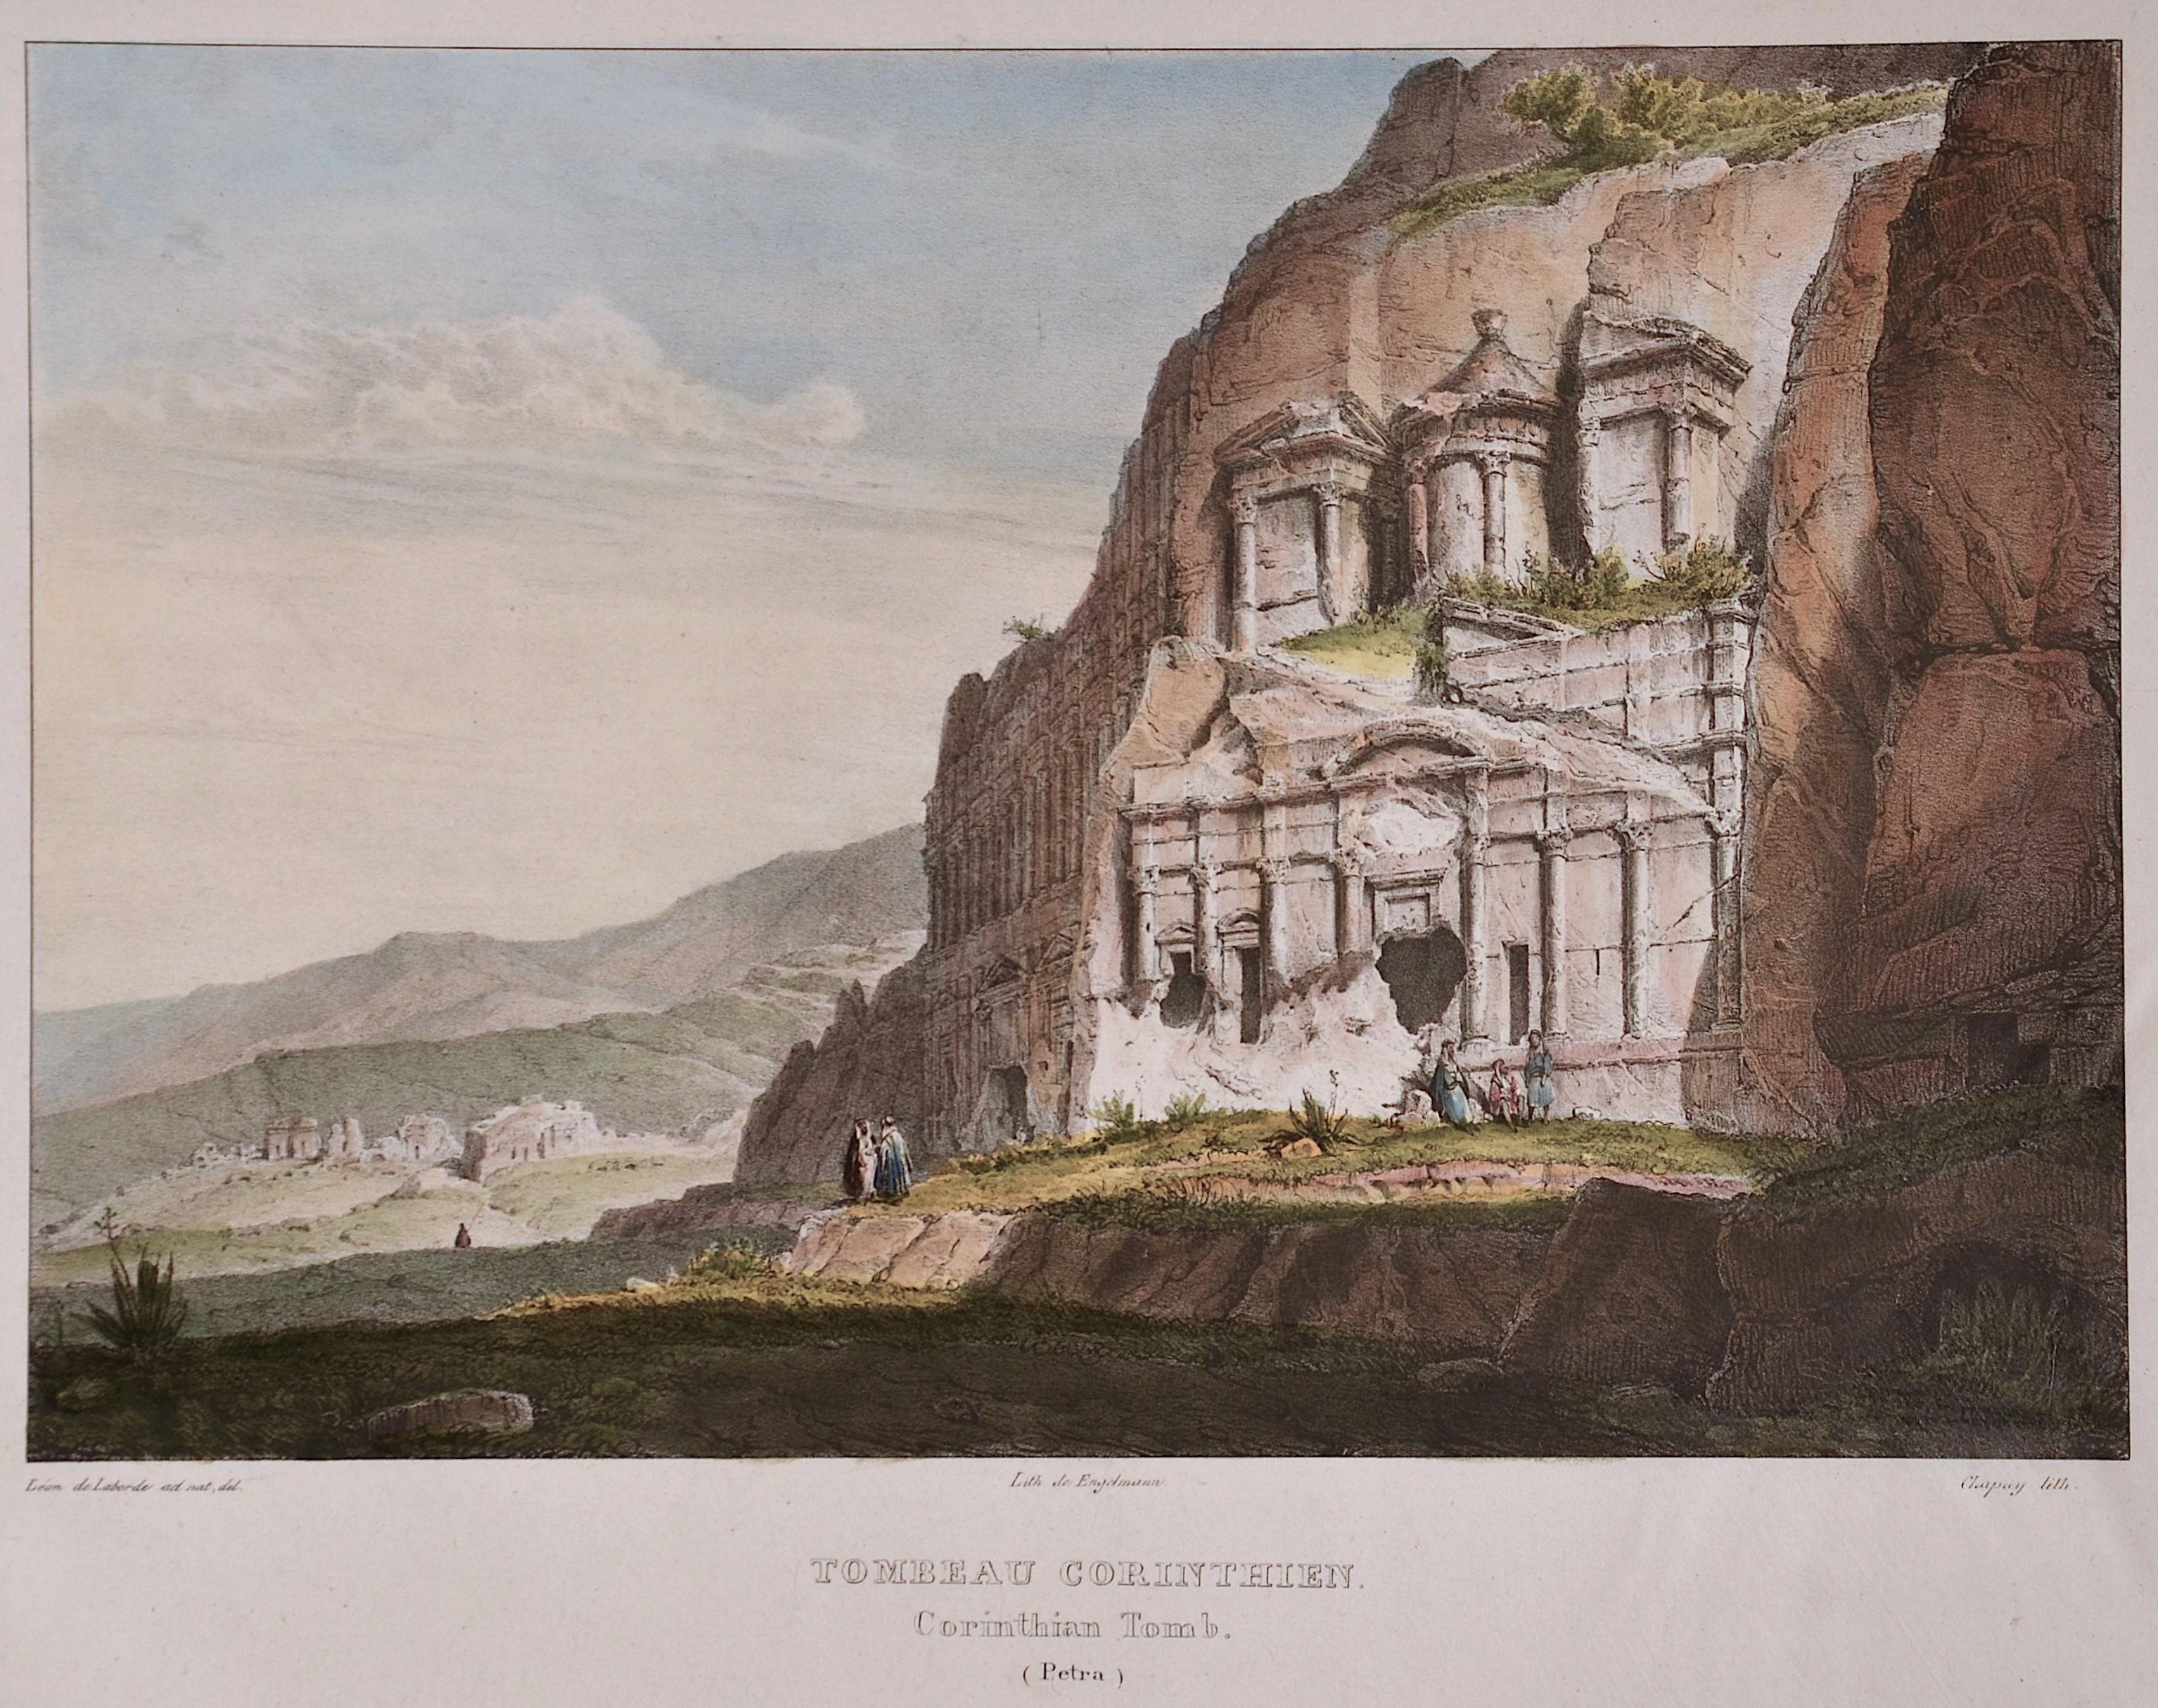 Engelmann  Tombeau Corinthien/ Corintian tomb ( Petra)